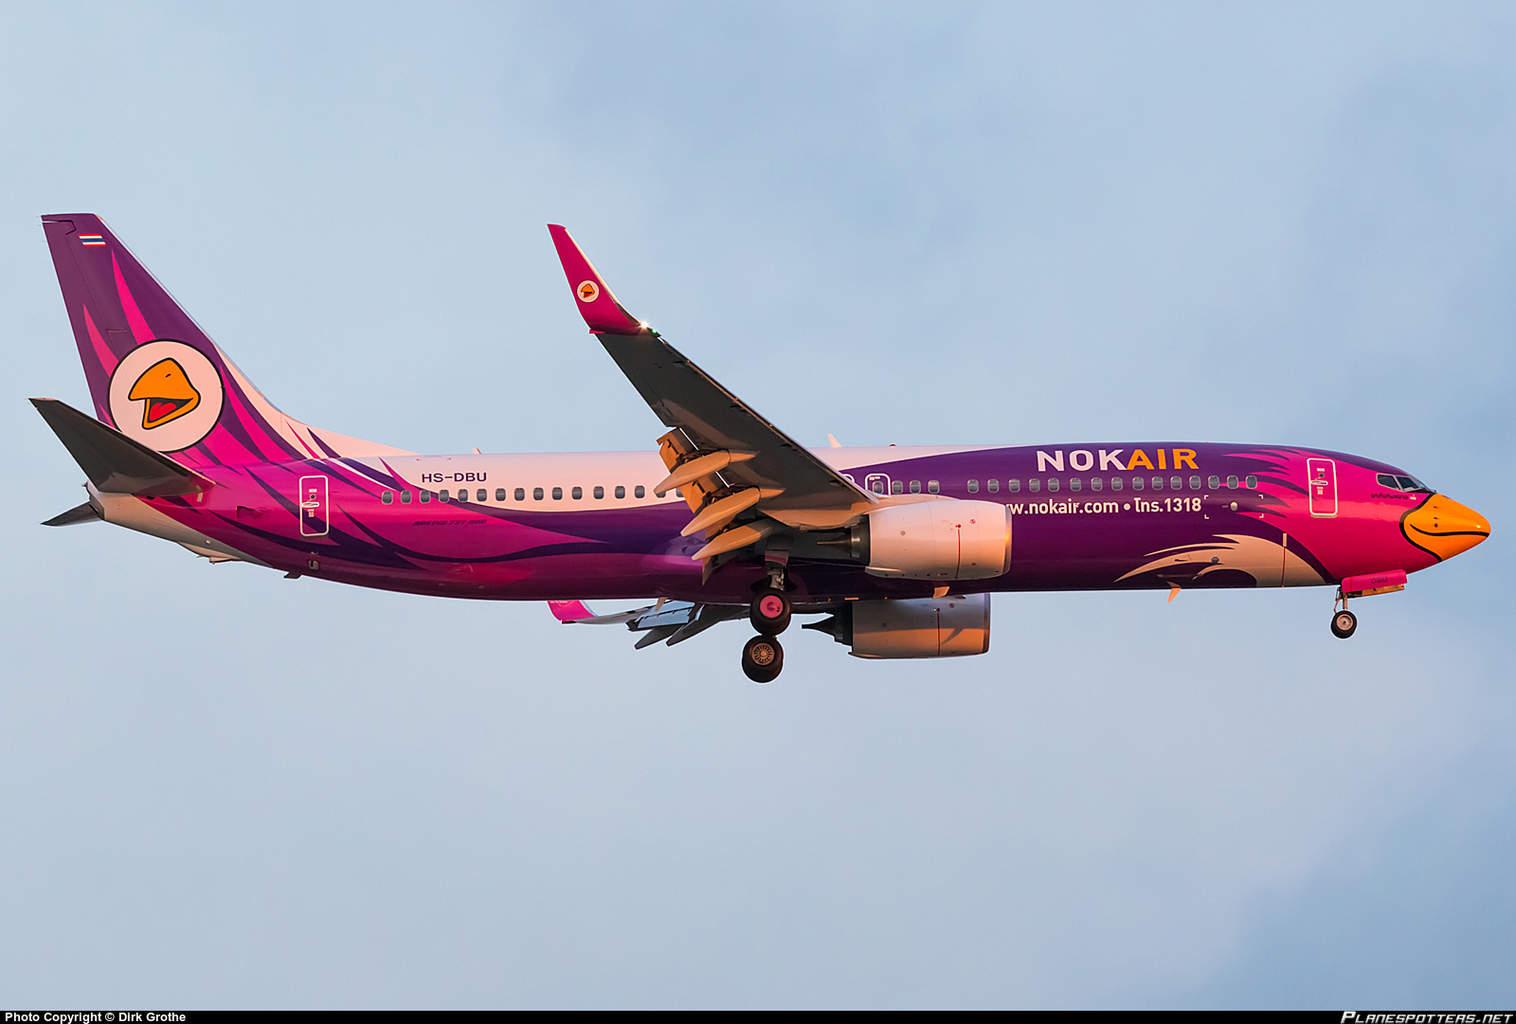 hs-dbu-nok-air-boeing-737-88lwl_PlanespottersNet_665299